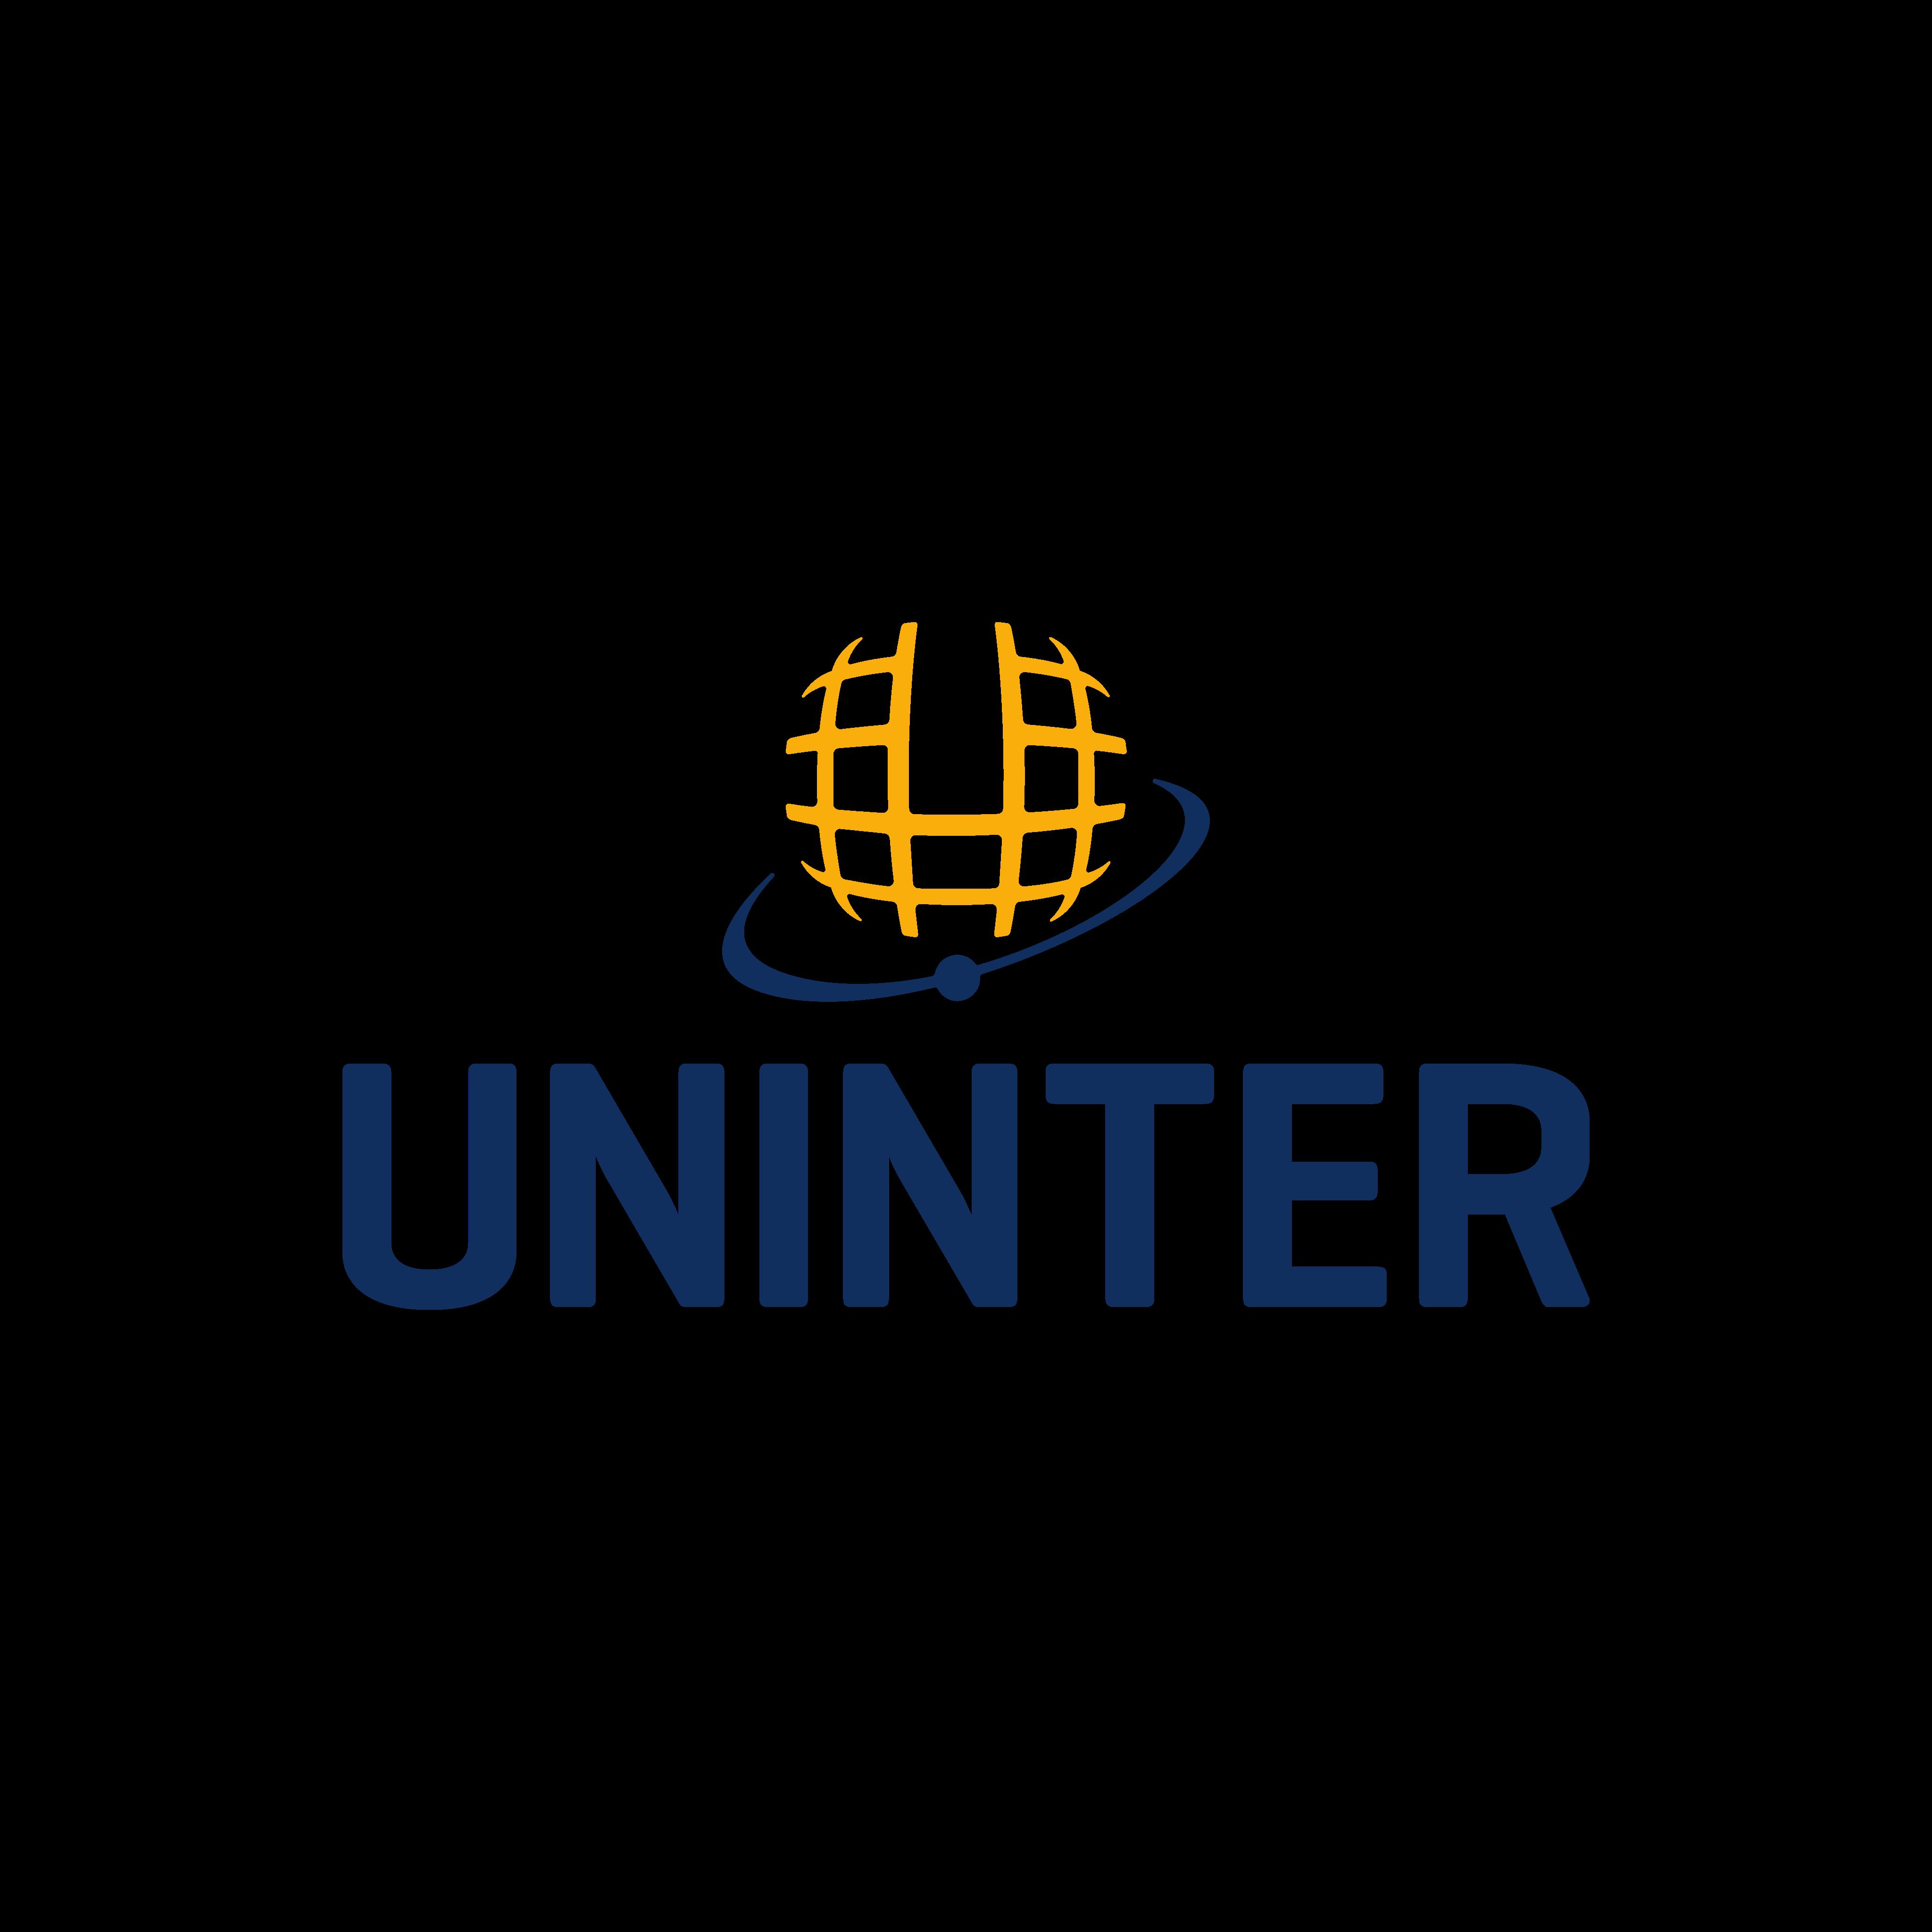 uninter logo 0 - Uninter Logo